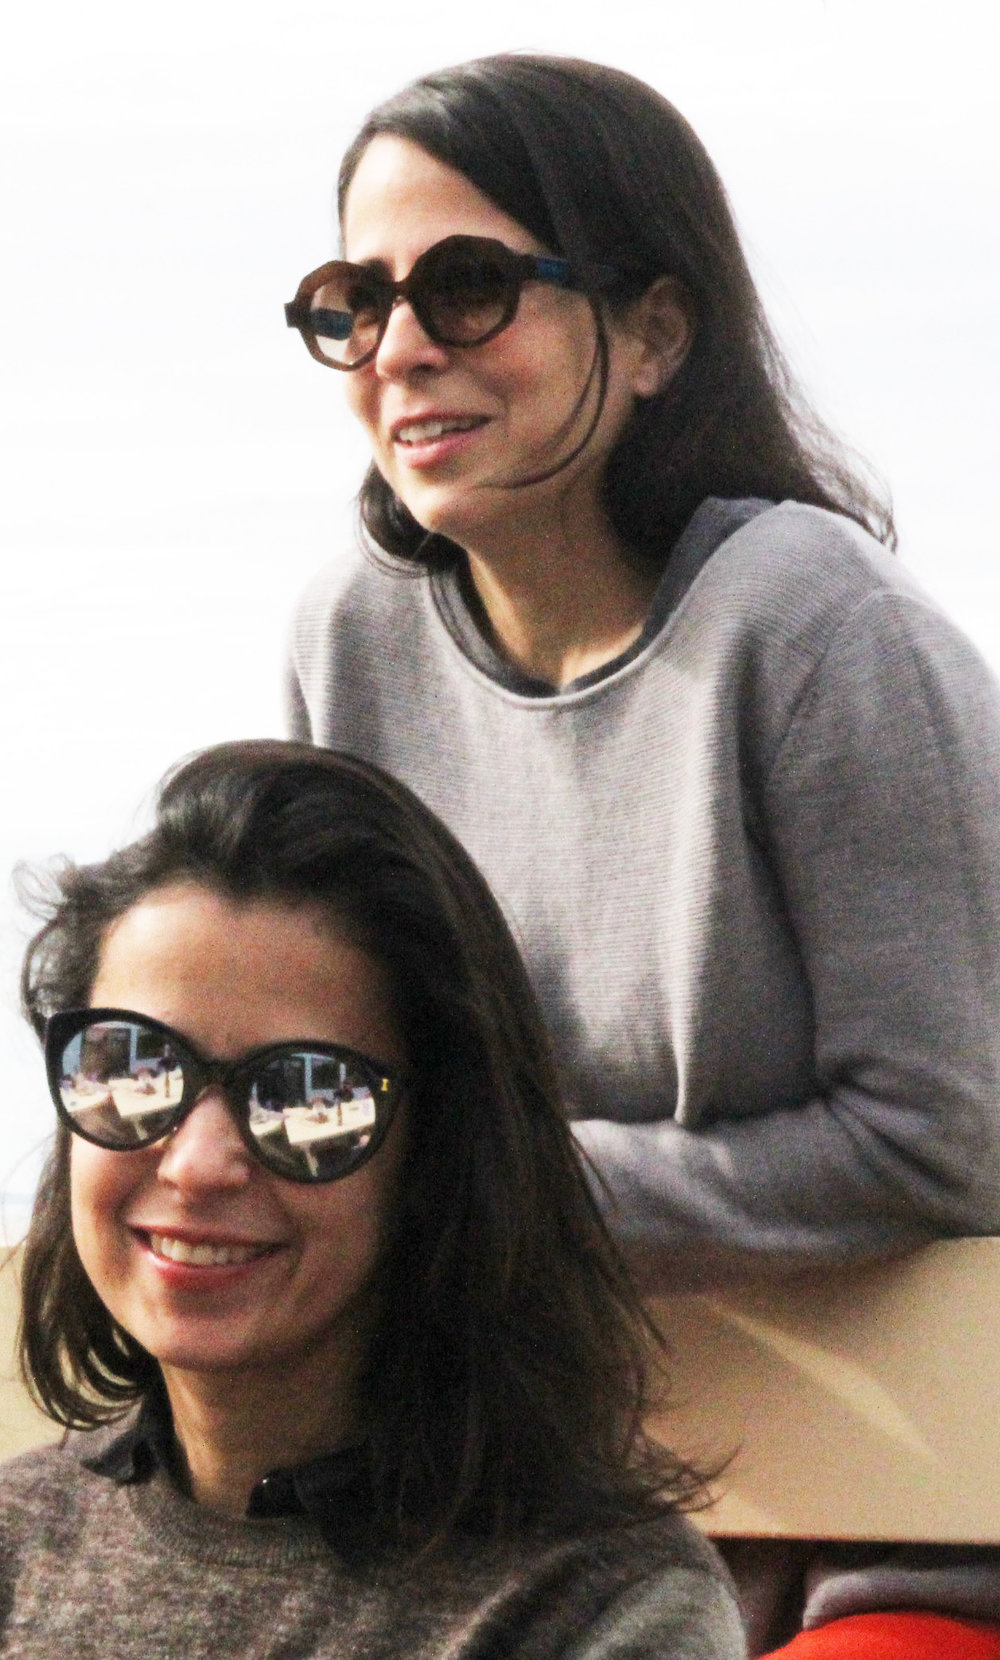 Ana e Isa.jpg